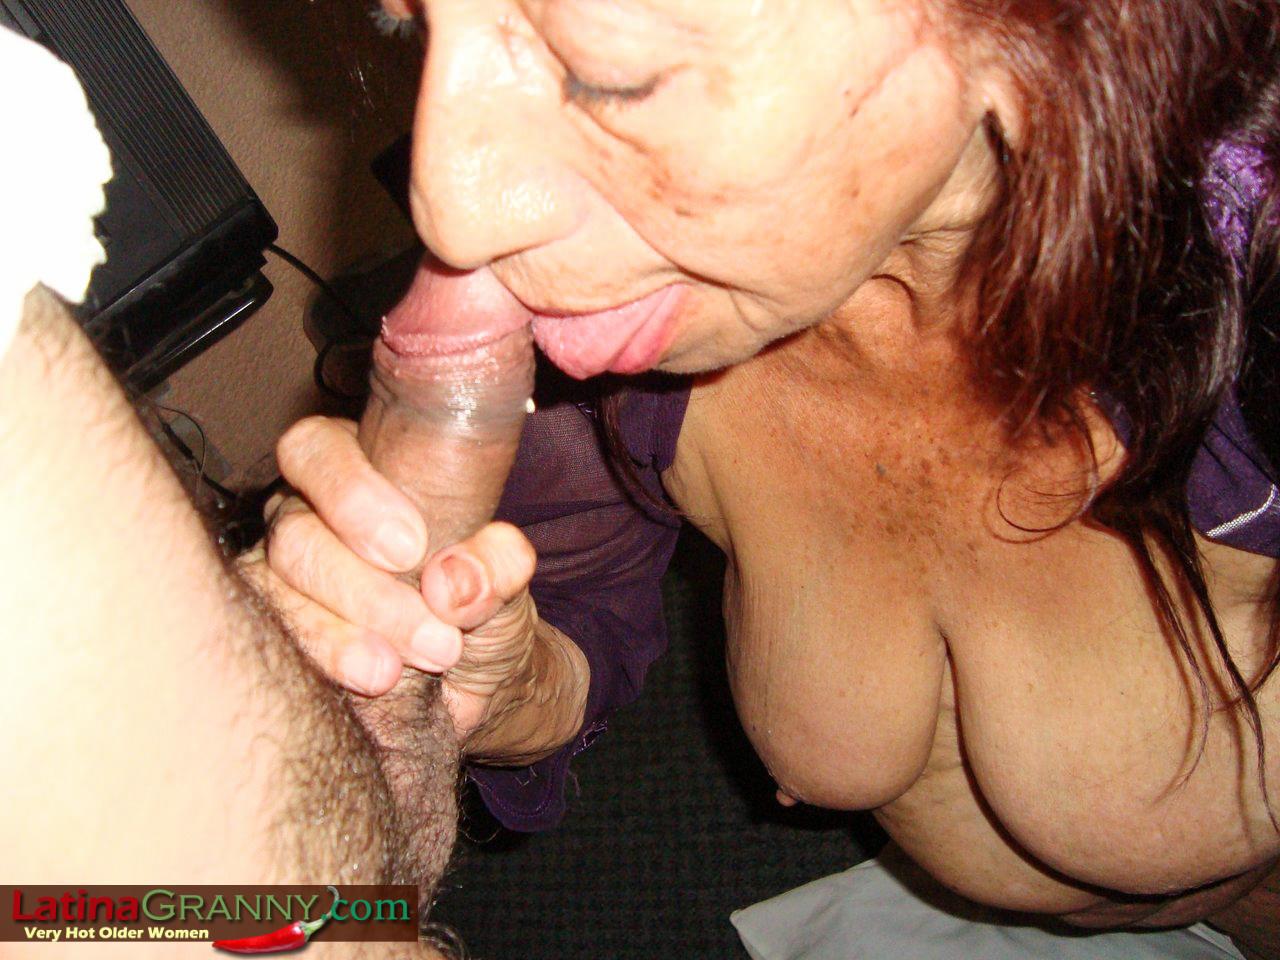 Apologise, but, mature latina sucks cock casually found